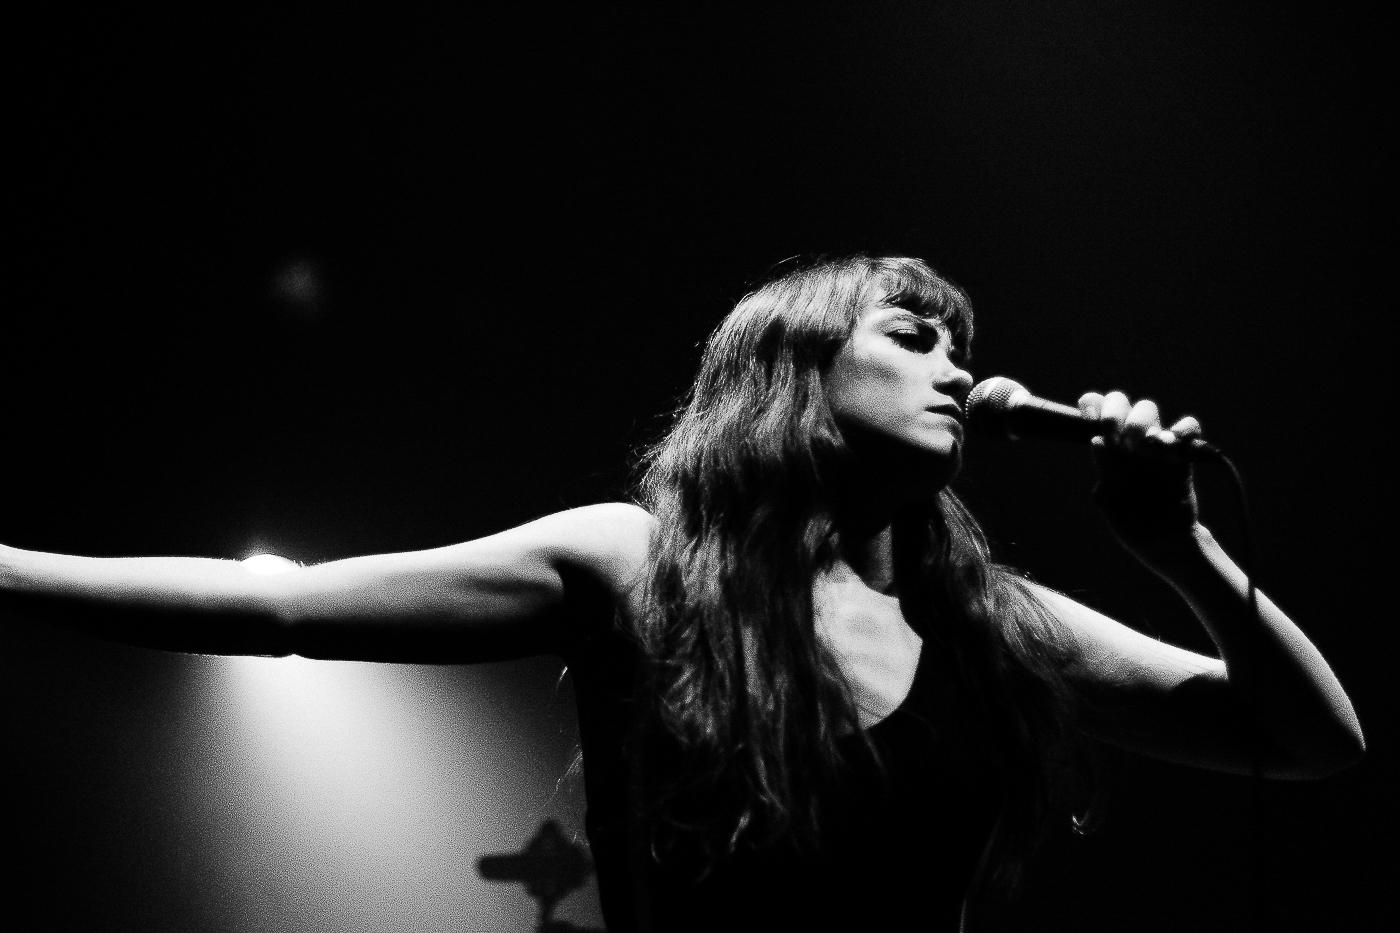 Photo by Mathieu Drouet